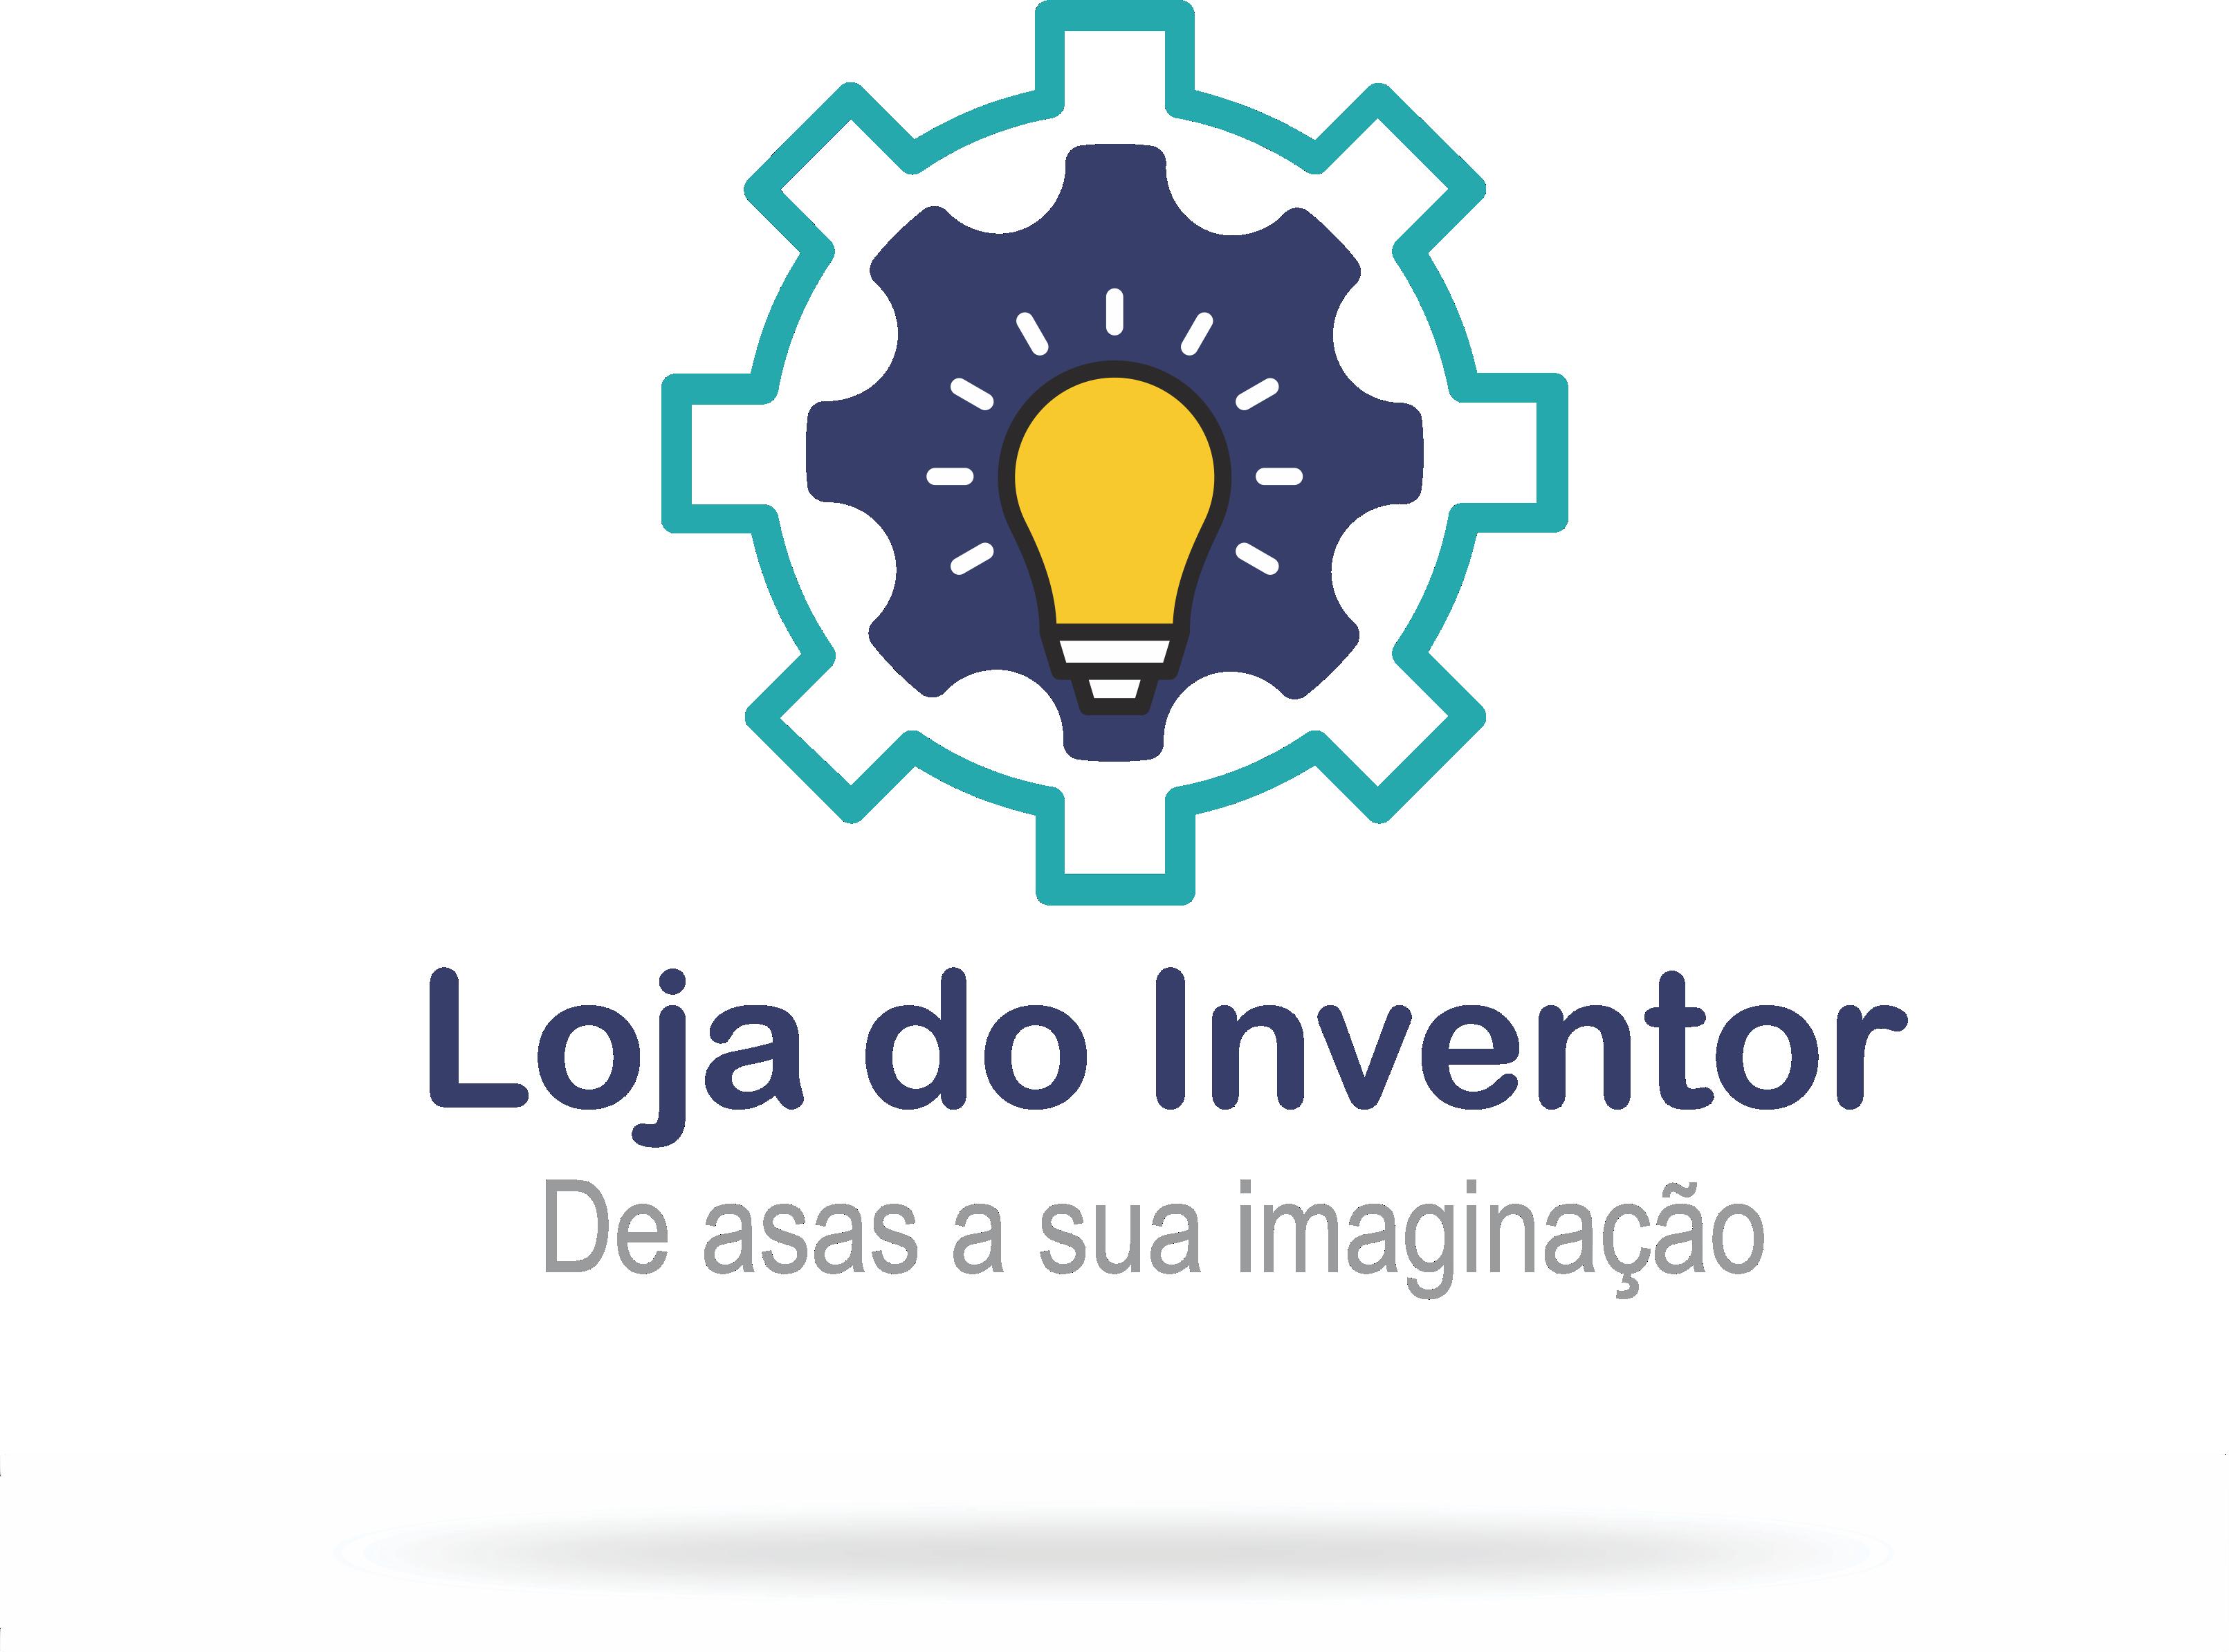 Loja do Inventor